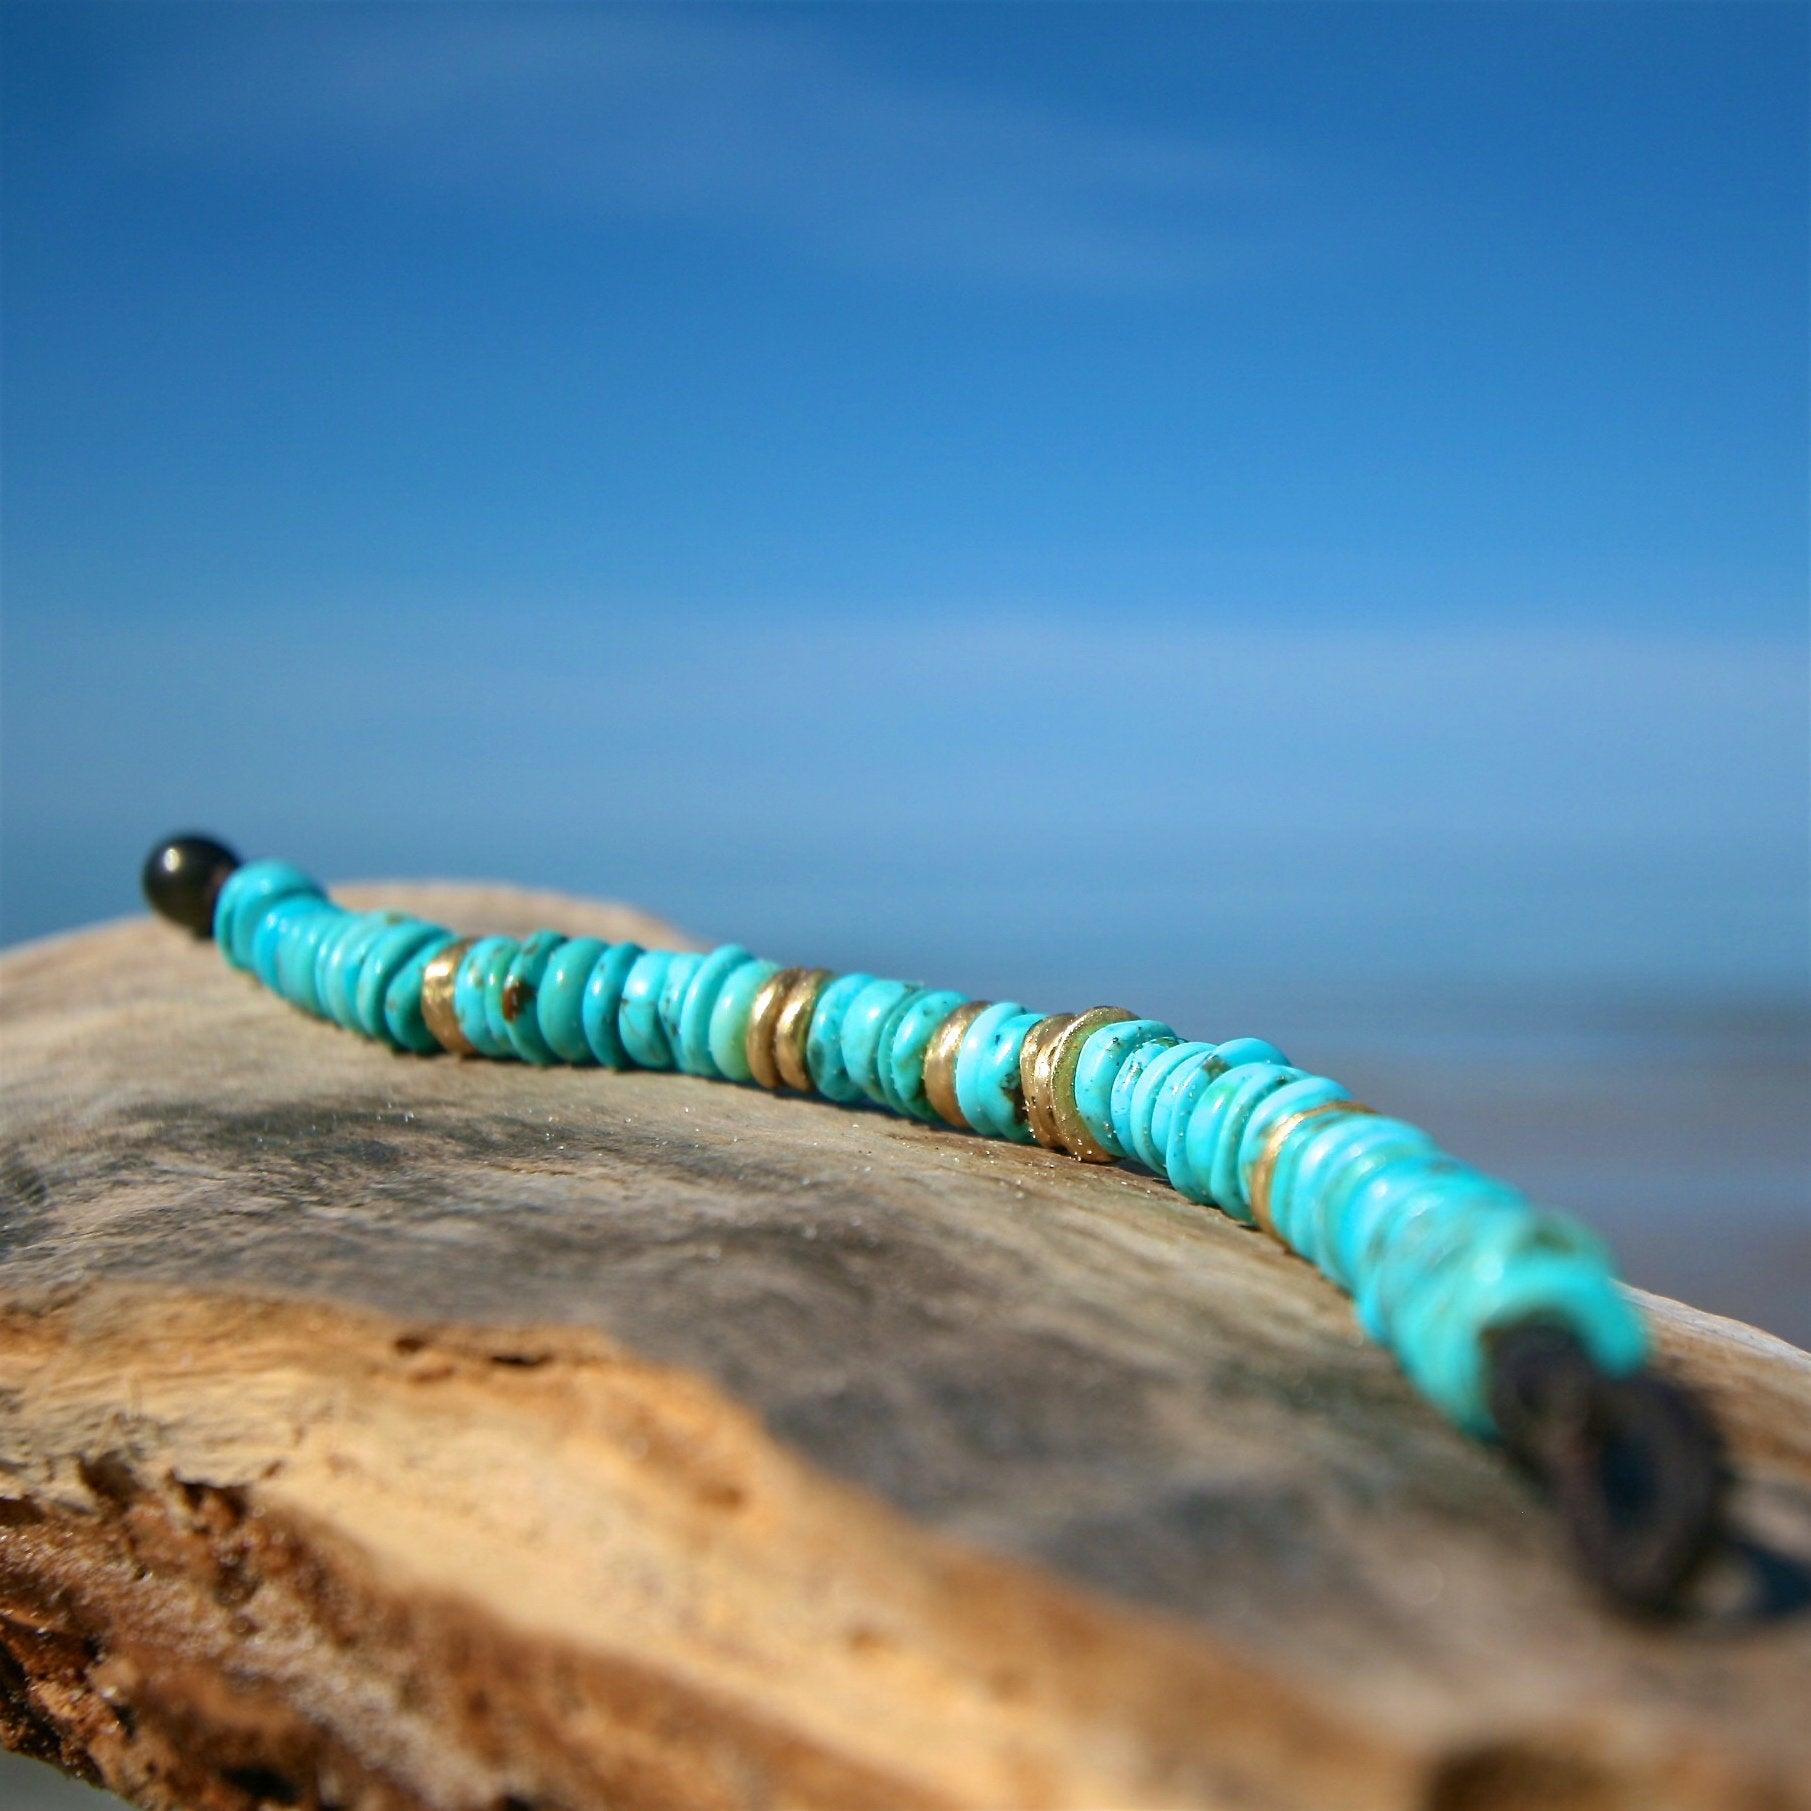 treasure leather bracelet st barth jewelry